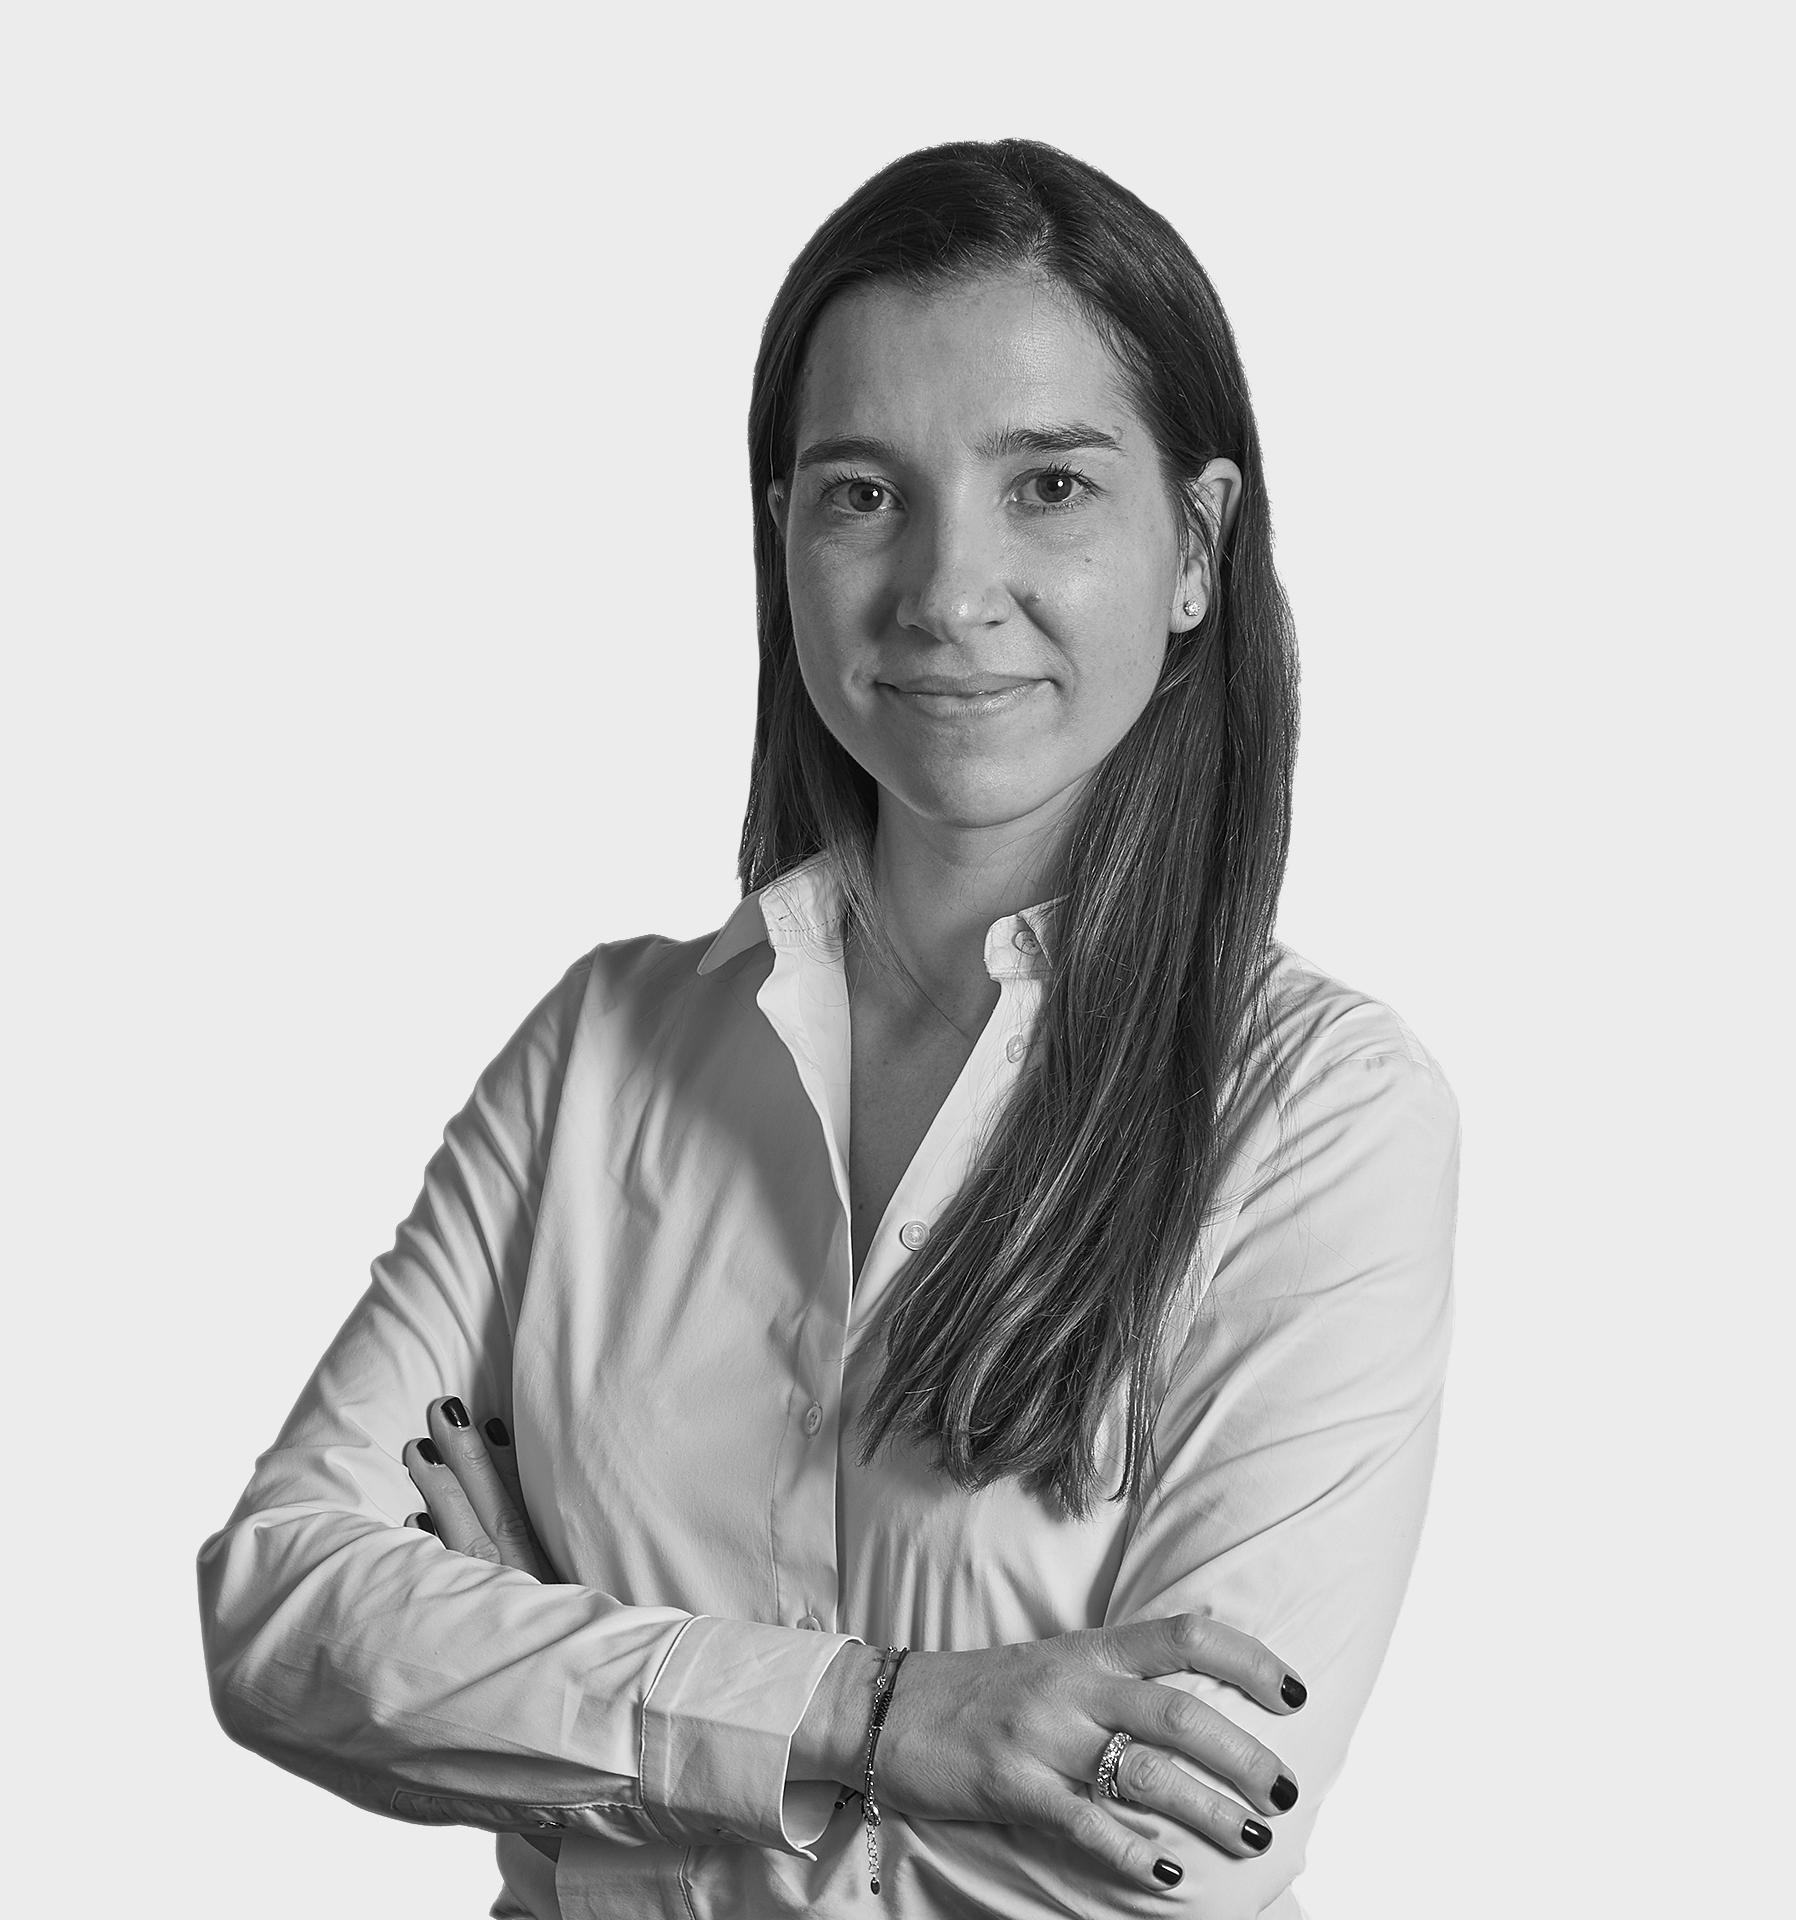 Eulàlia Puig